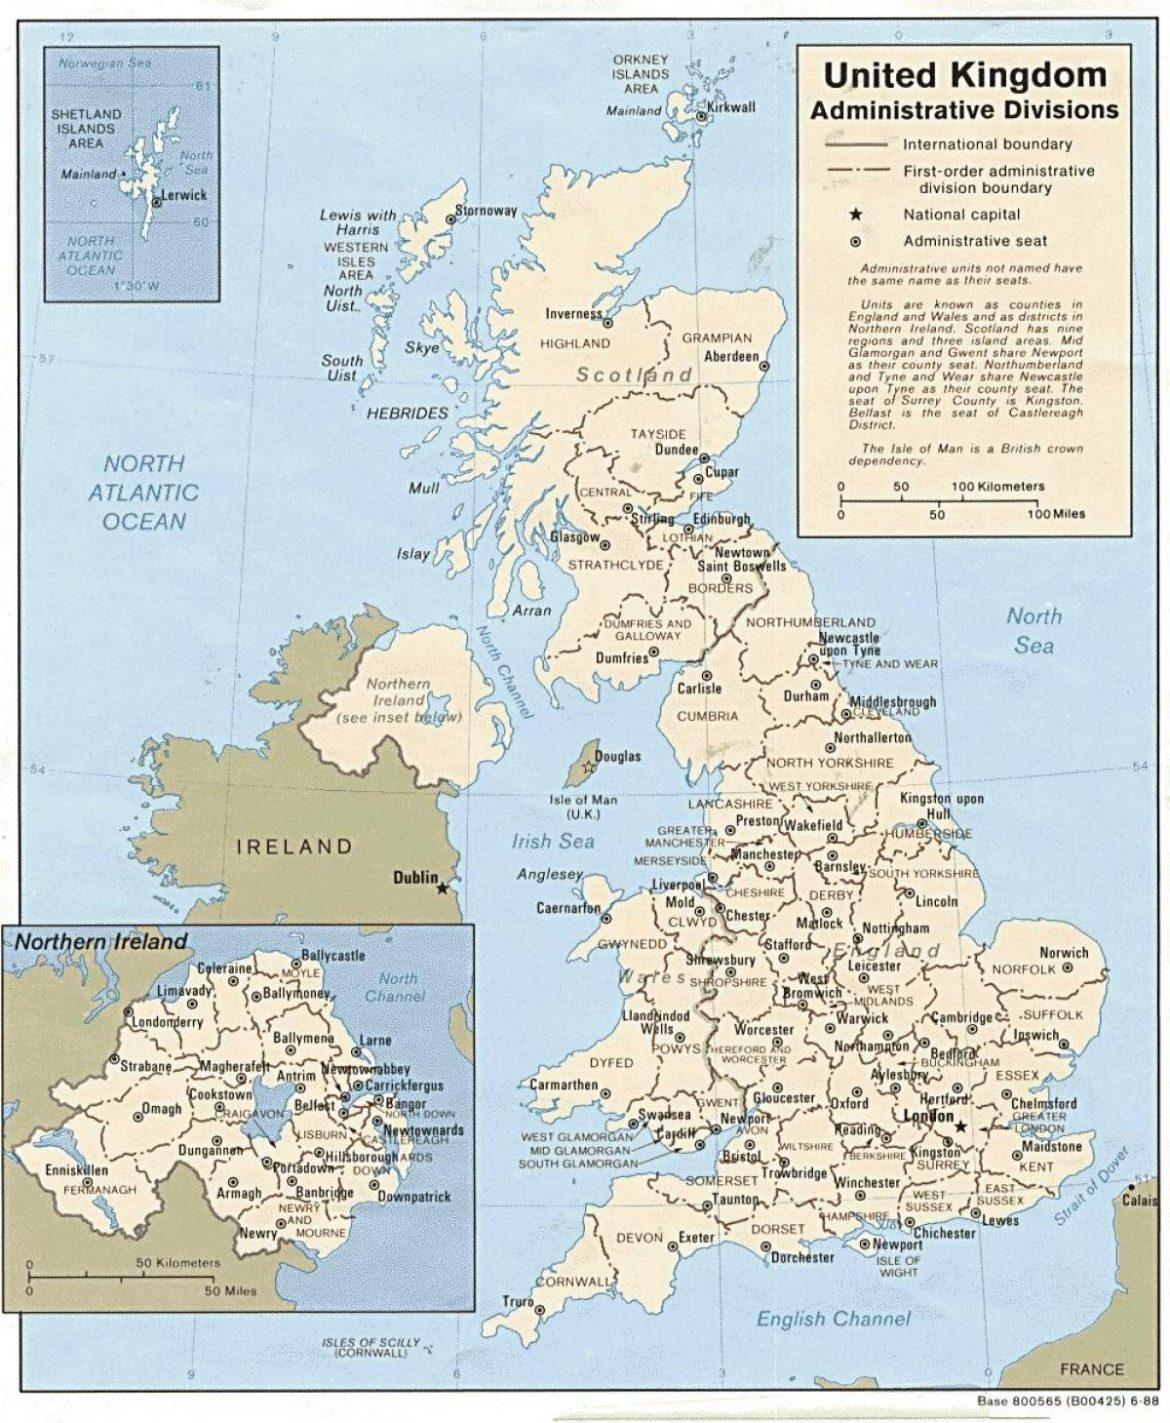 Mapa de reino unido para imprimir, masquelibros